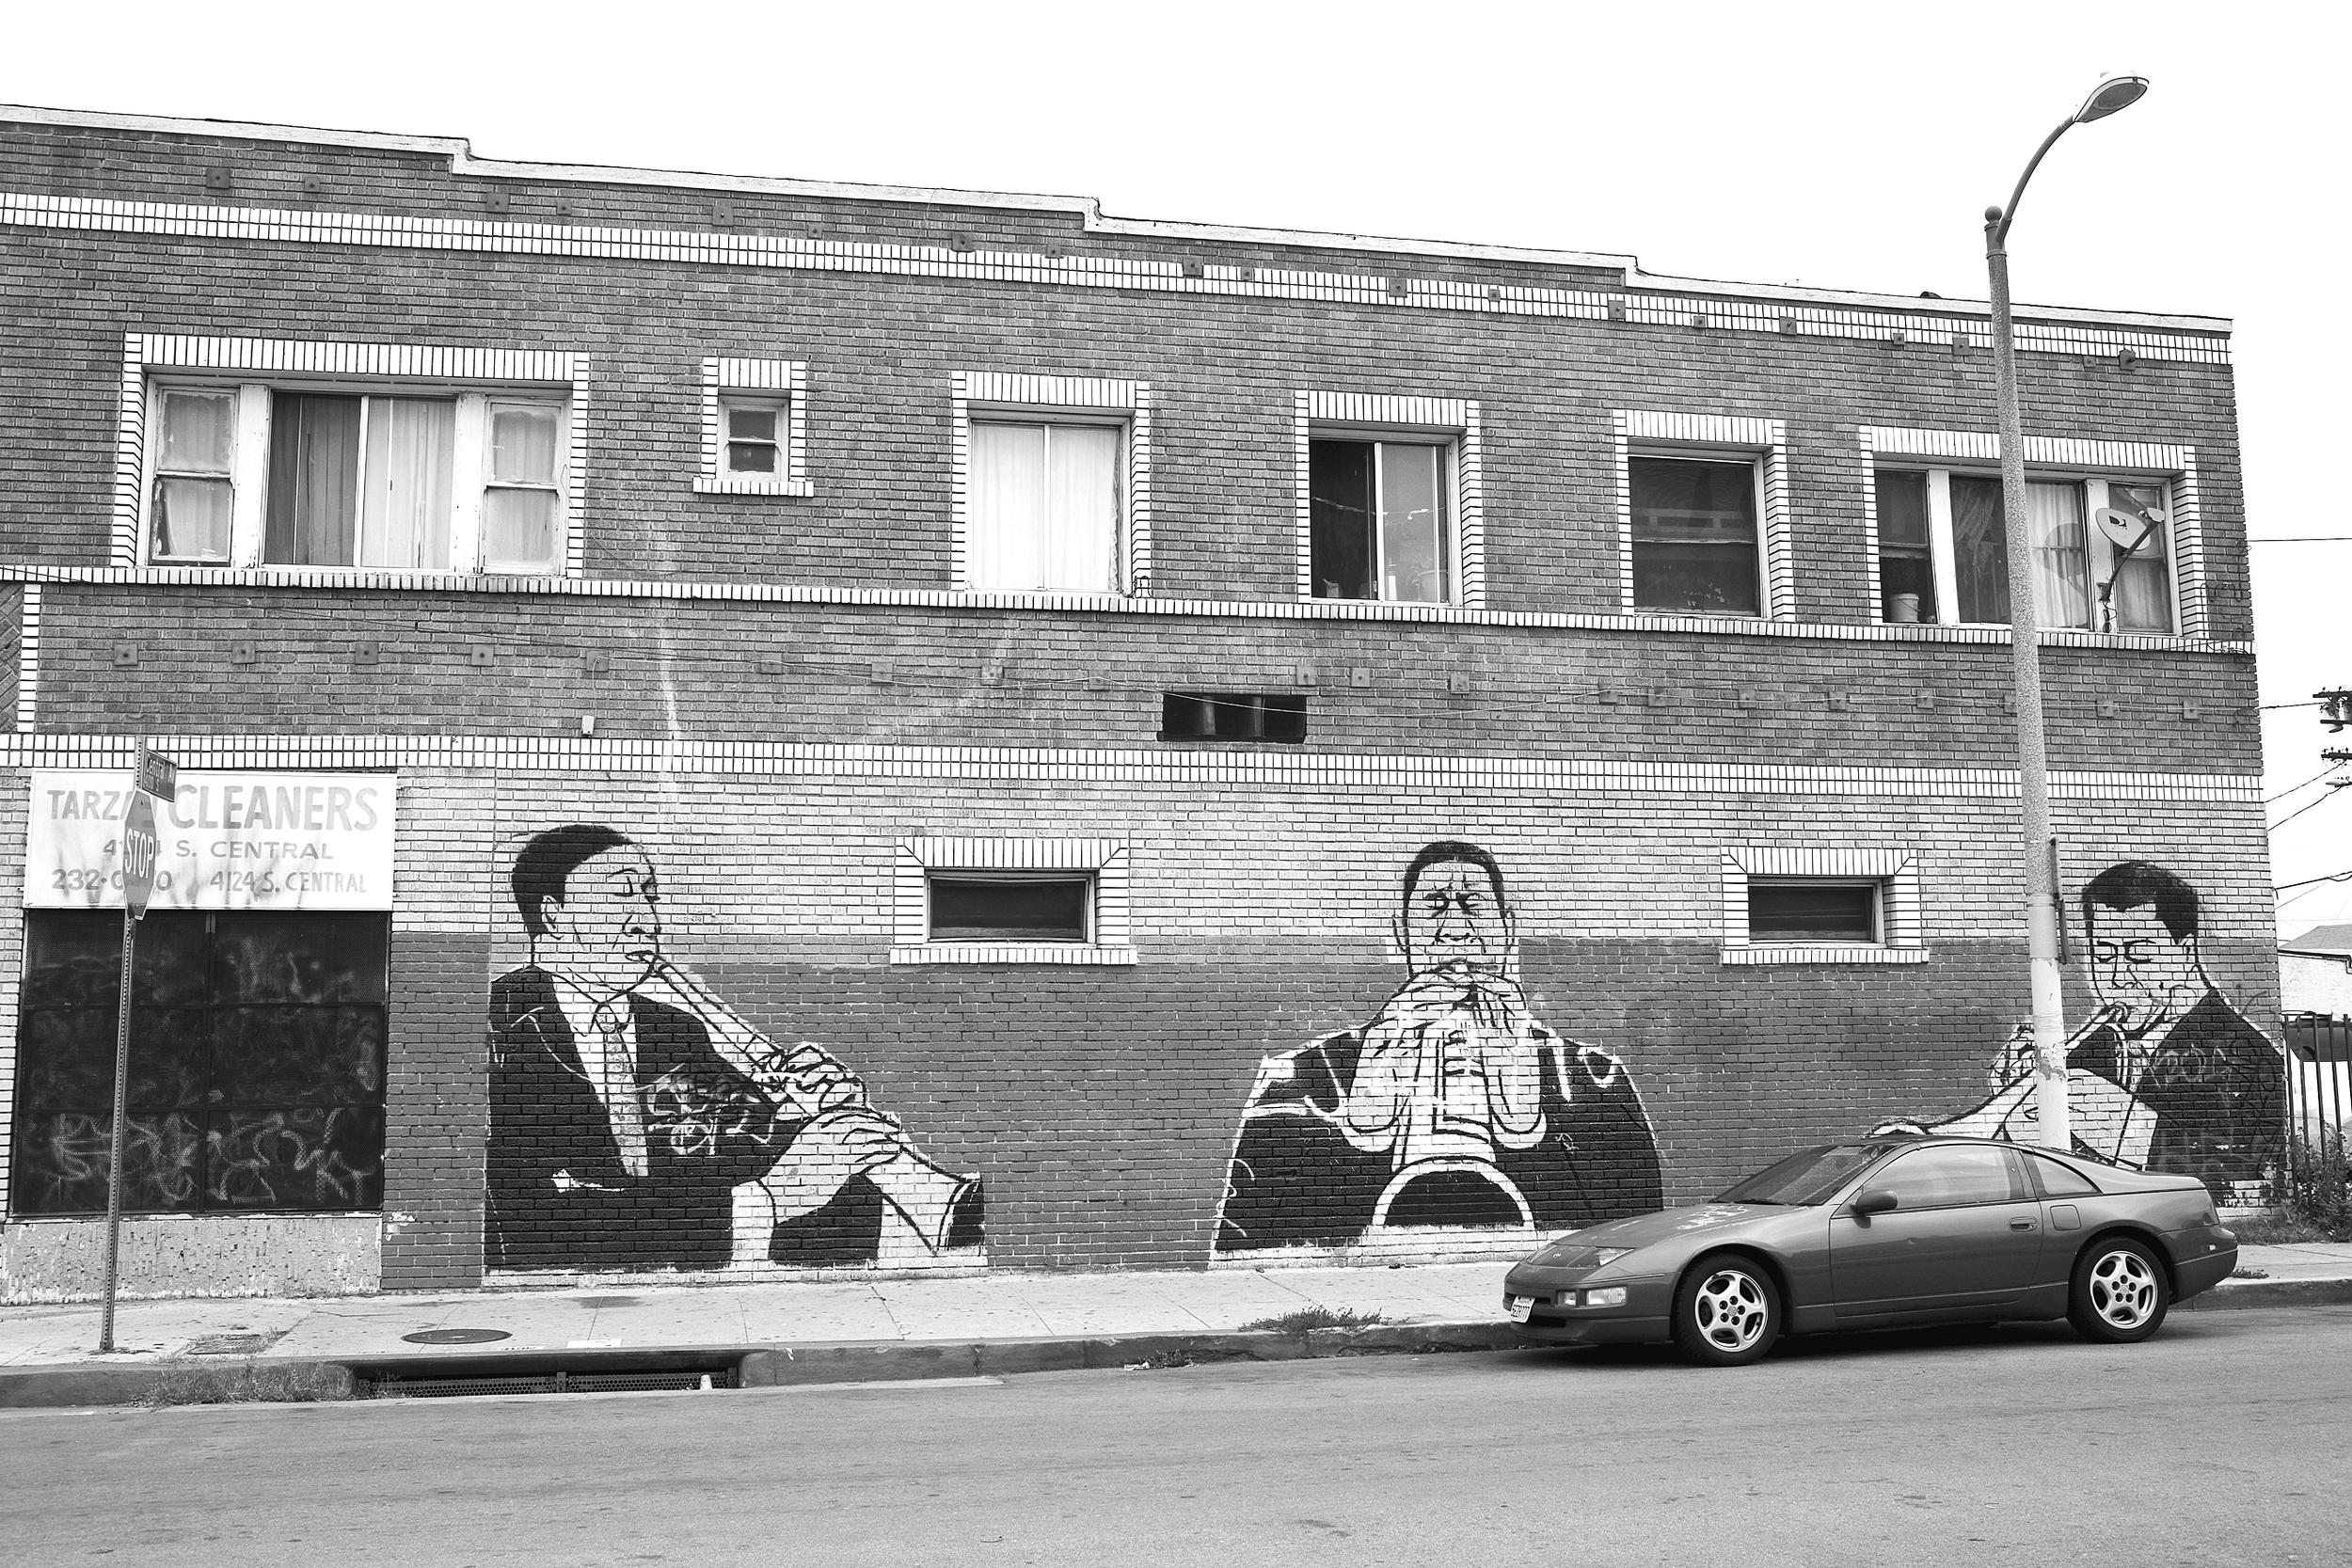 "Jazz musicians mural, Central Avenue, South Los Angeles. 2009.                                0     false             18 pt     18 pt     0     0         false     false     false                                                     /* Style Definitions */ table.MsoNormalTable {mso-style-name:""Table Normal""; mso-tstyle-rowband-size:0; mso-tstyle-colband-size:0; mso-style-noshow:yes; mso-style-parent:""""; mso-padding-alt:0in 5.4pt 0in 5.4pt; mso-para-margin:0in; mso-para-margin-bottom:.0001pt; mso-pagination:widow-orphan; font-size:10.0pt; font-family:""Times New Roman"";}"